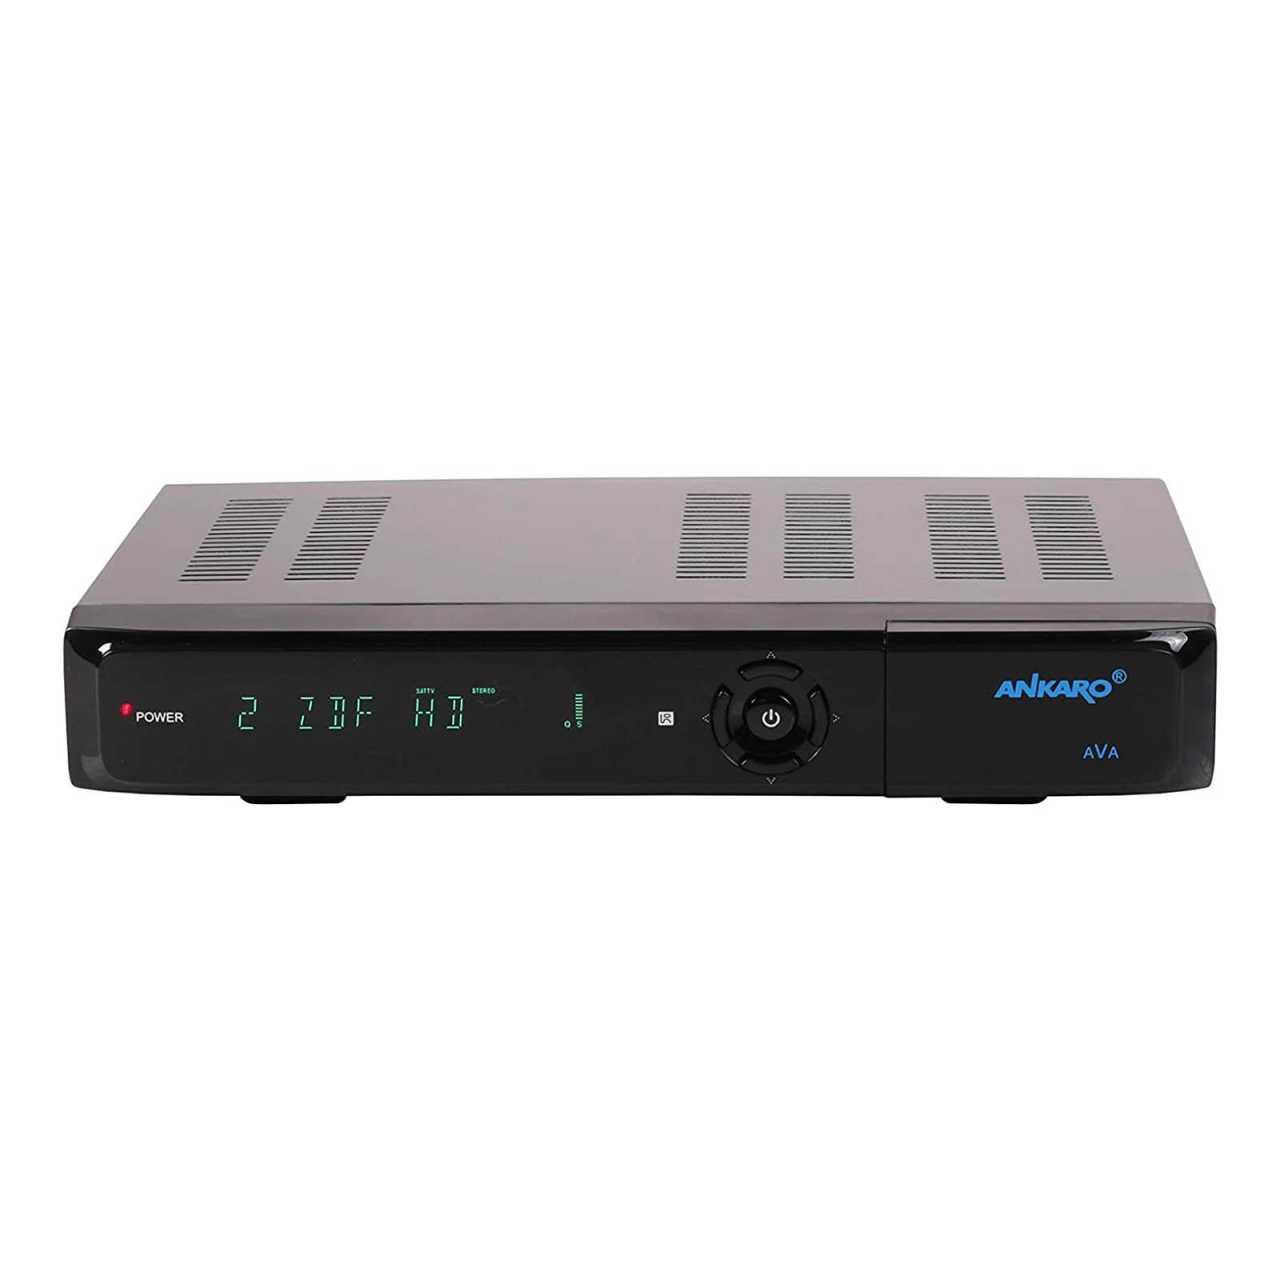 Ankaro AVA Digitaler 4K UHD 2160p Multistream 3D HDR10 USB HDMI DVB-S2X Satelliten Receiver RECANK001